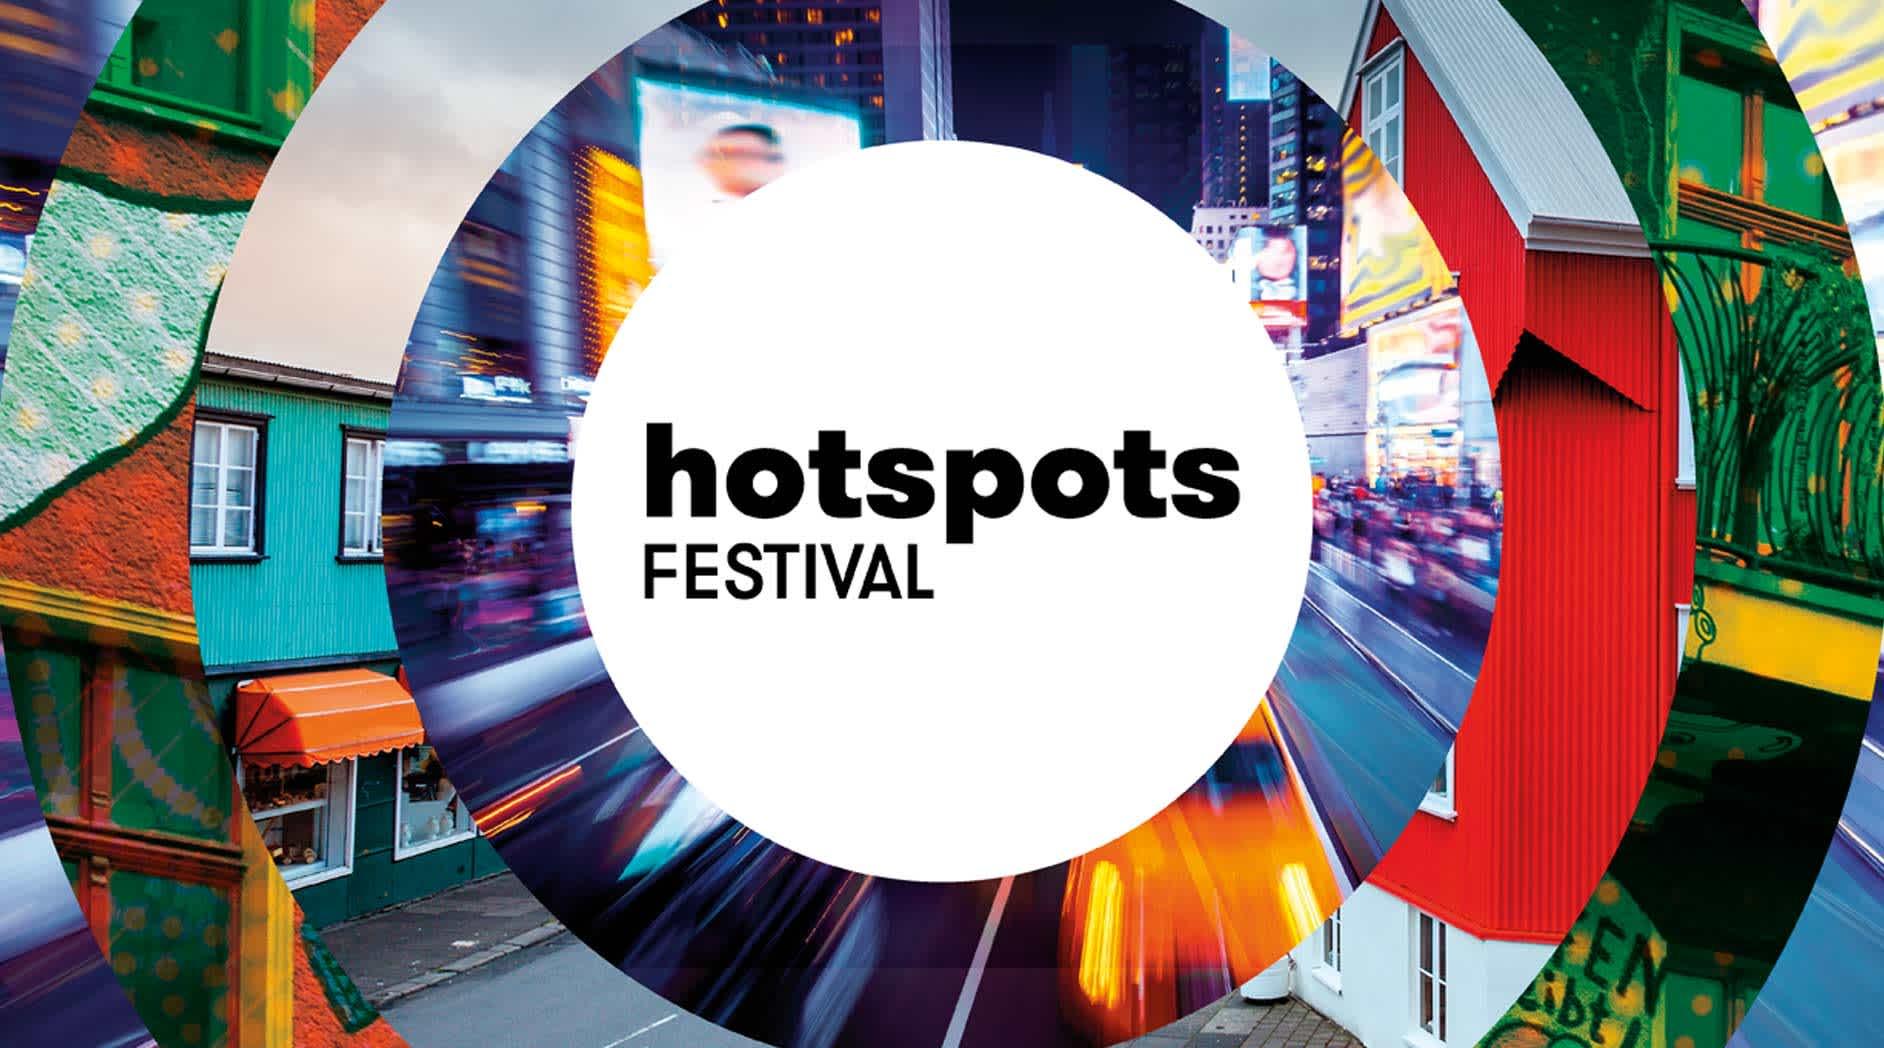 hotspots festival